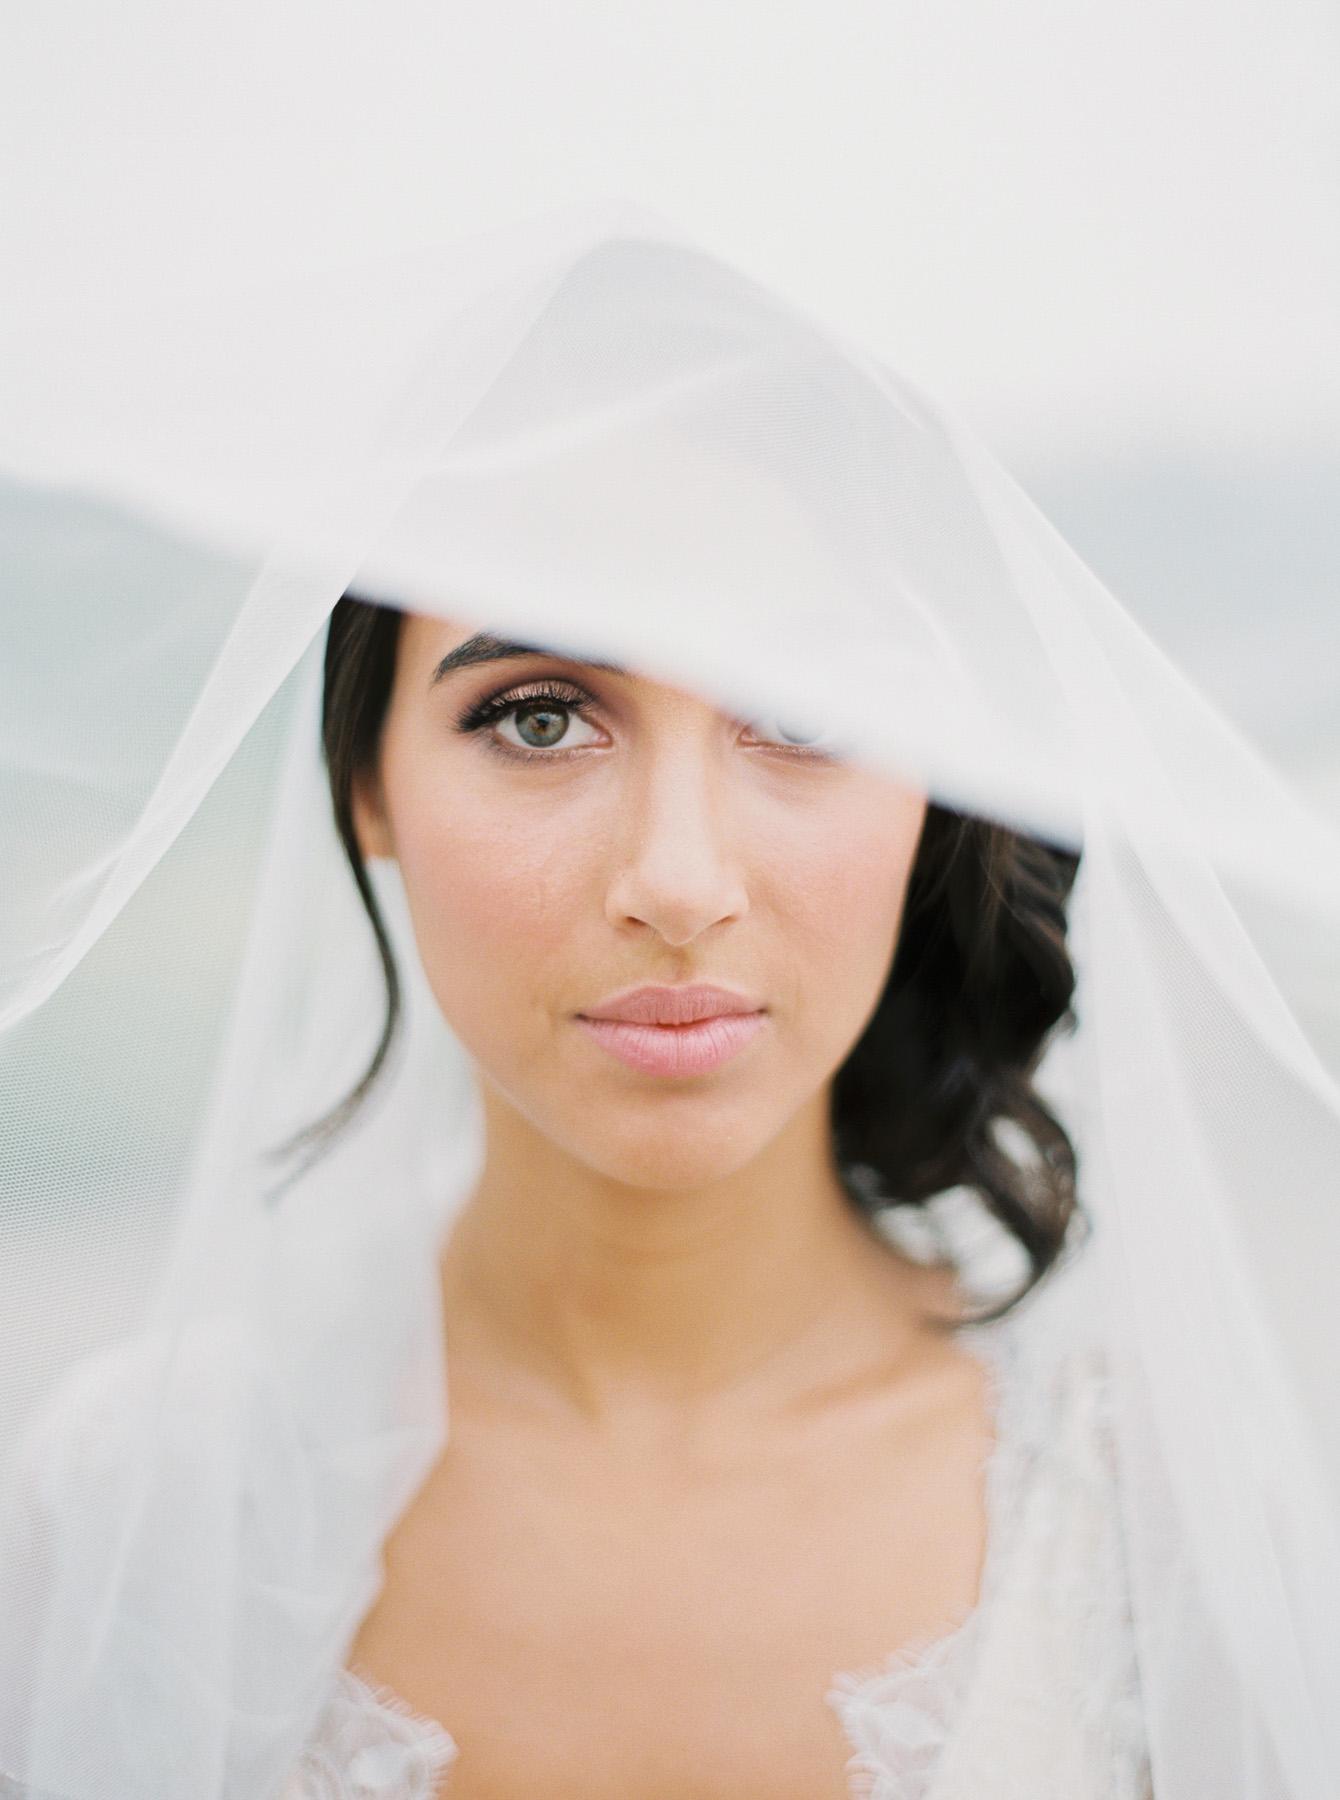 Carlos-Hernandez-Fine-Art-Film-Wedding-Editorial-Photography-Portland-Oregon-Monet-Vineyards-French-France-038